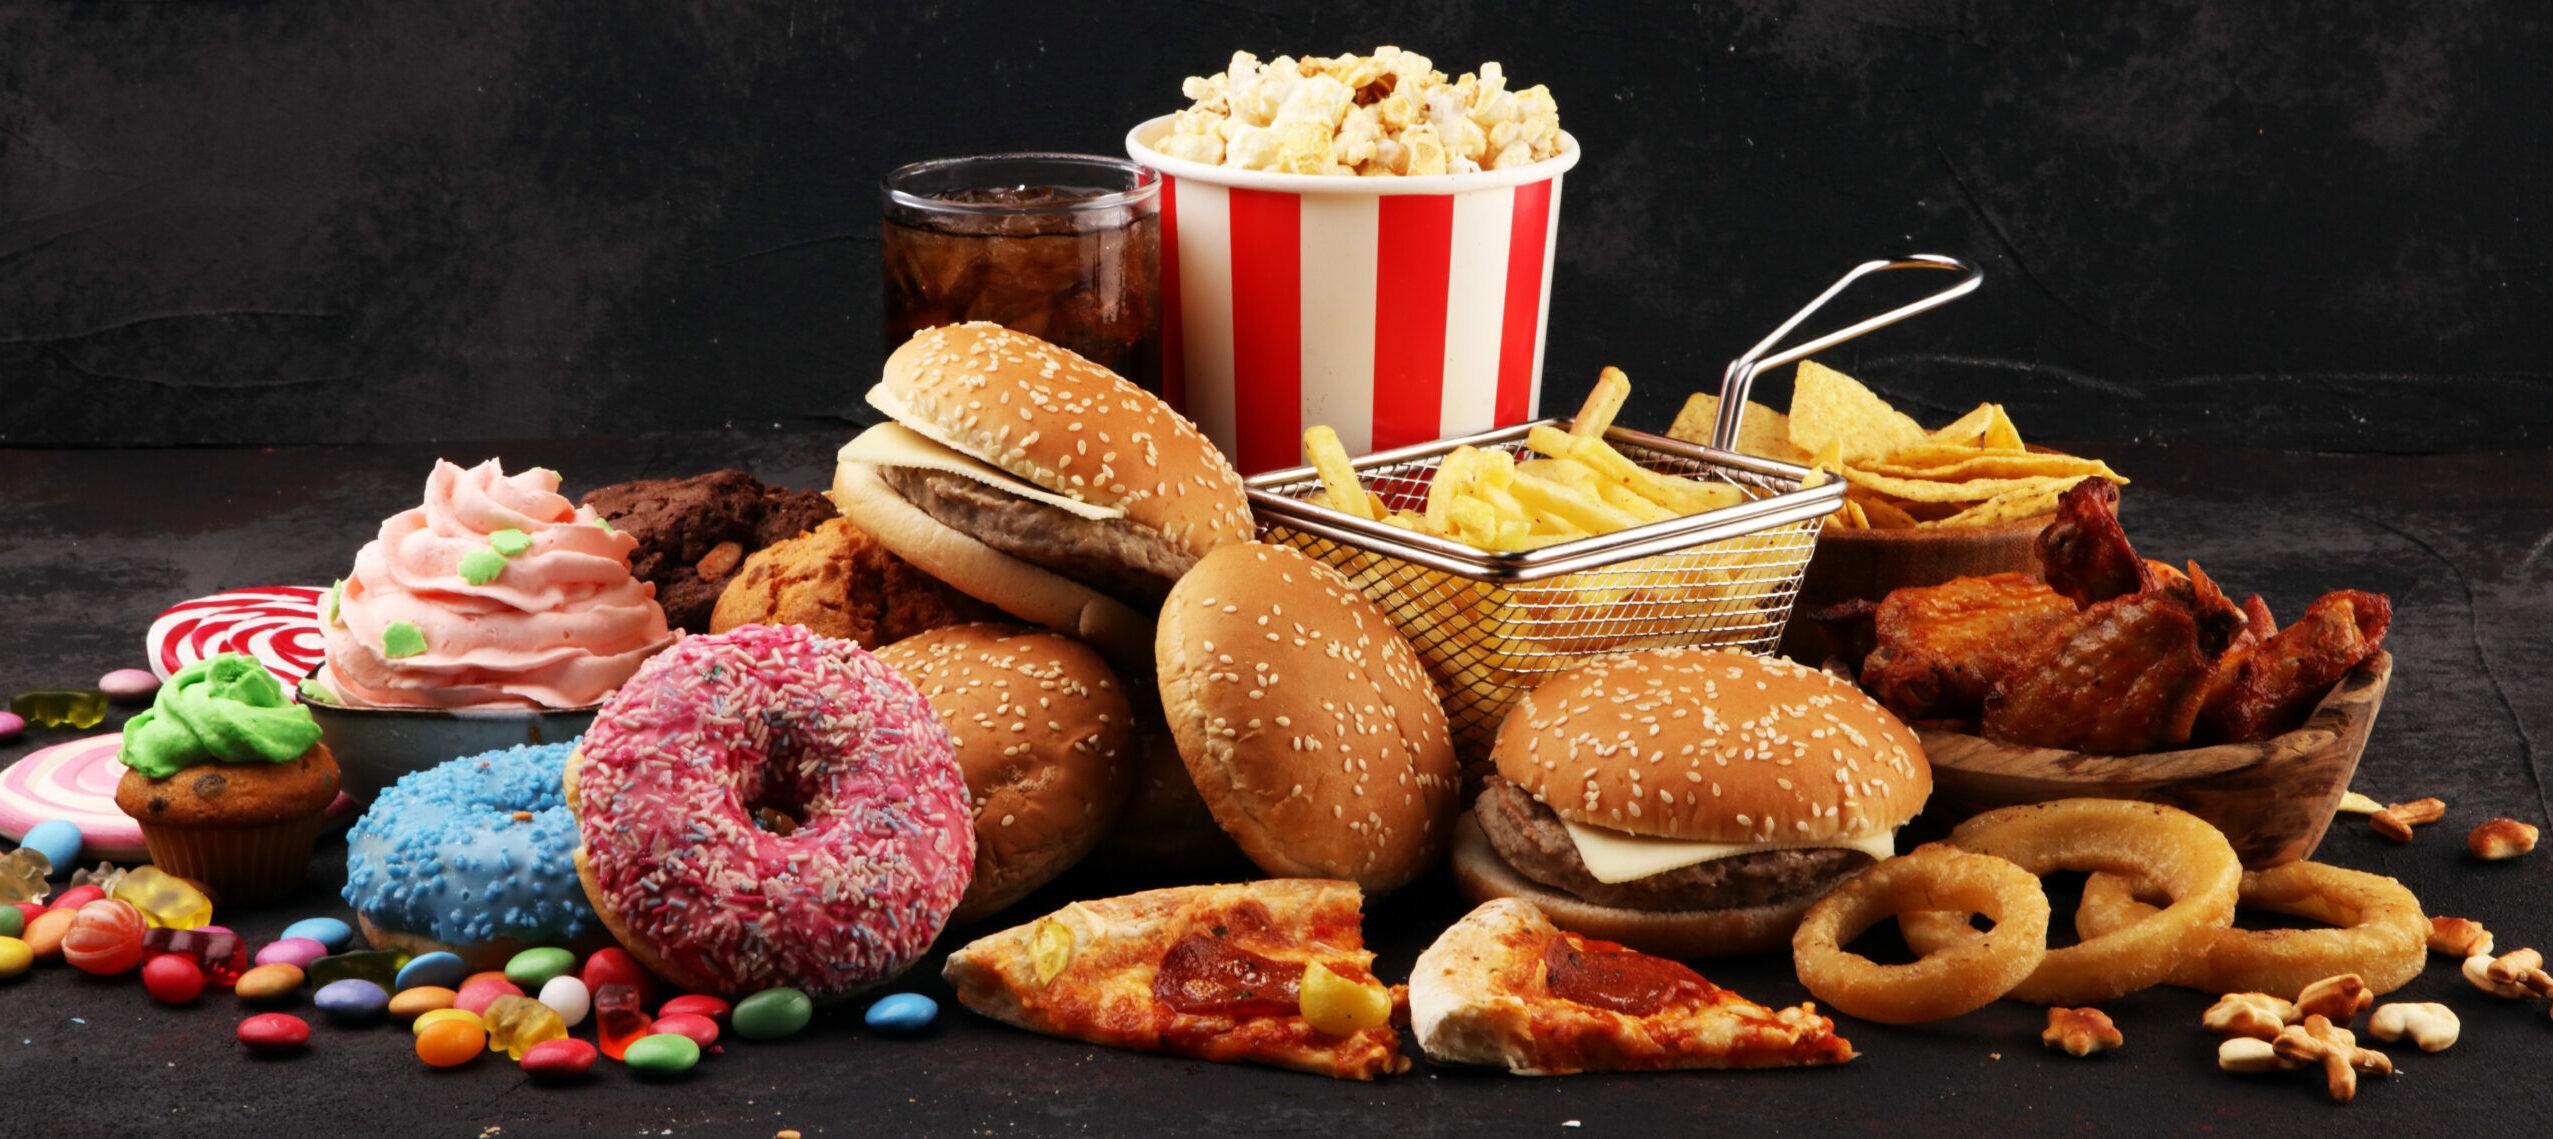 Avoiding spiritual junk food